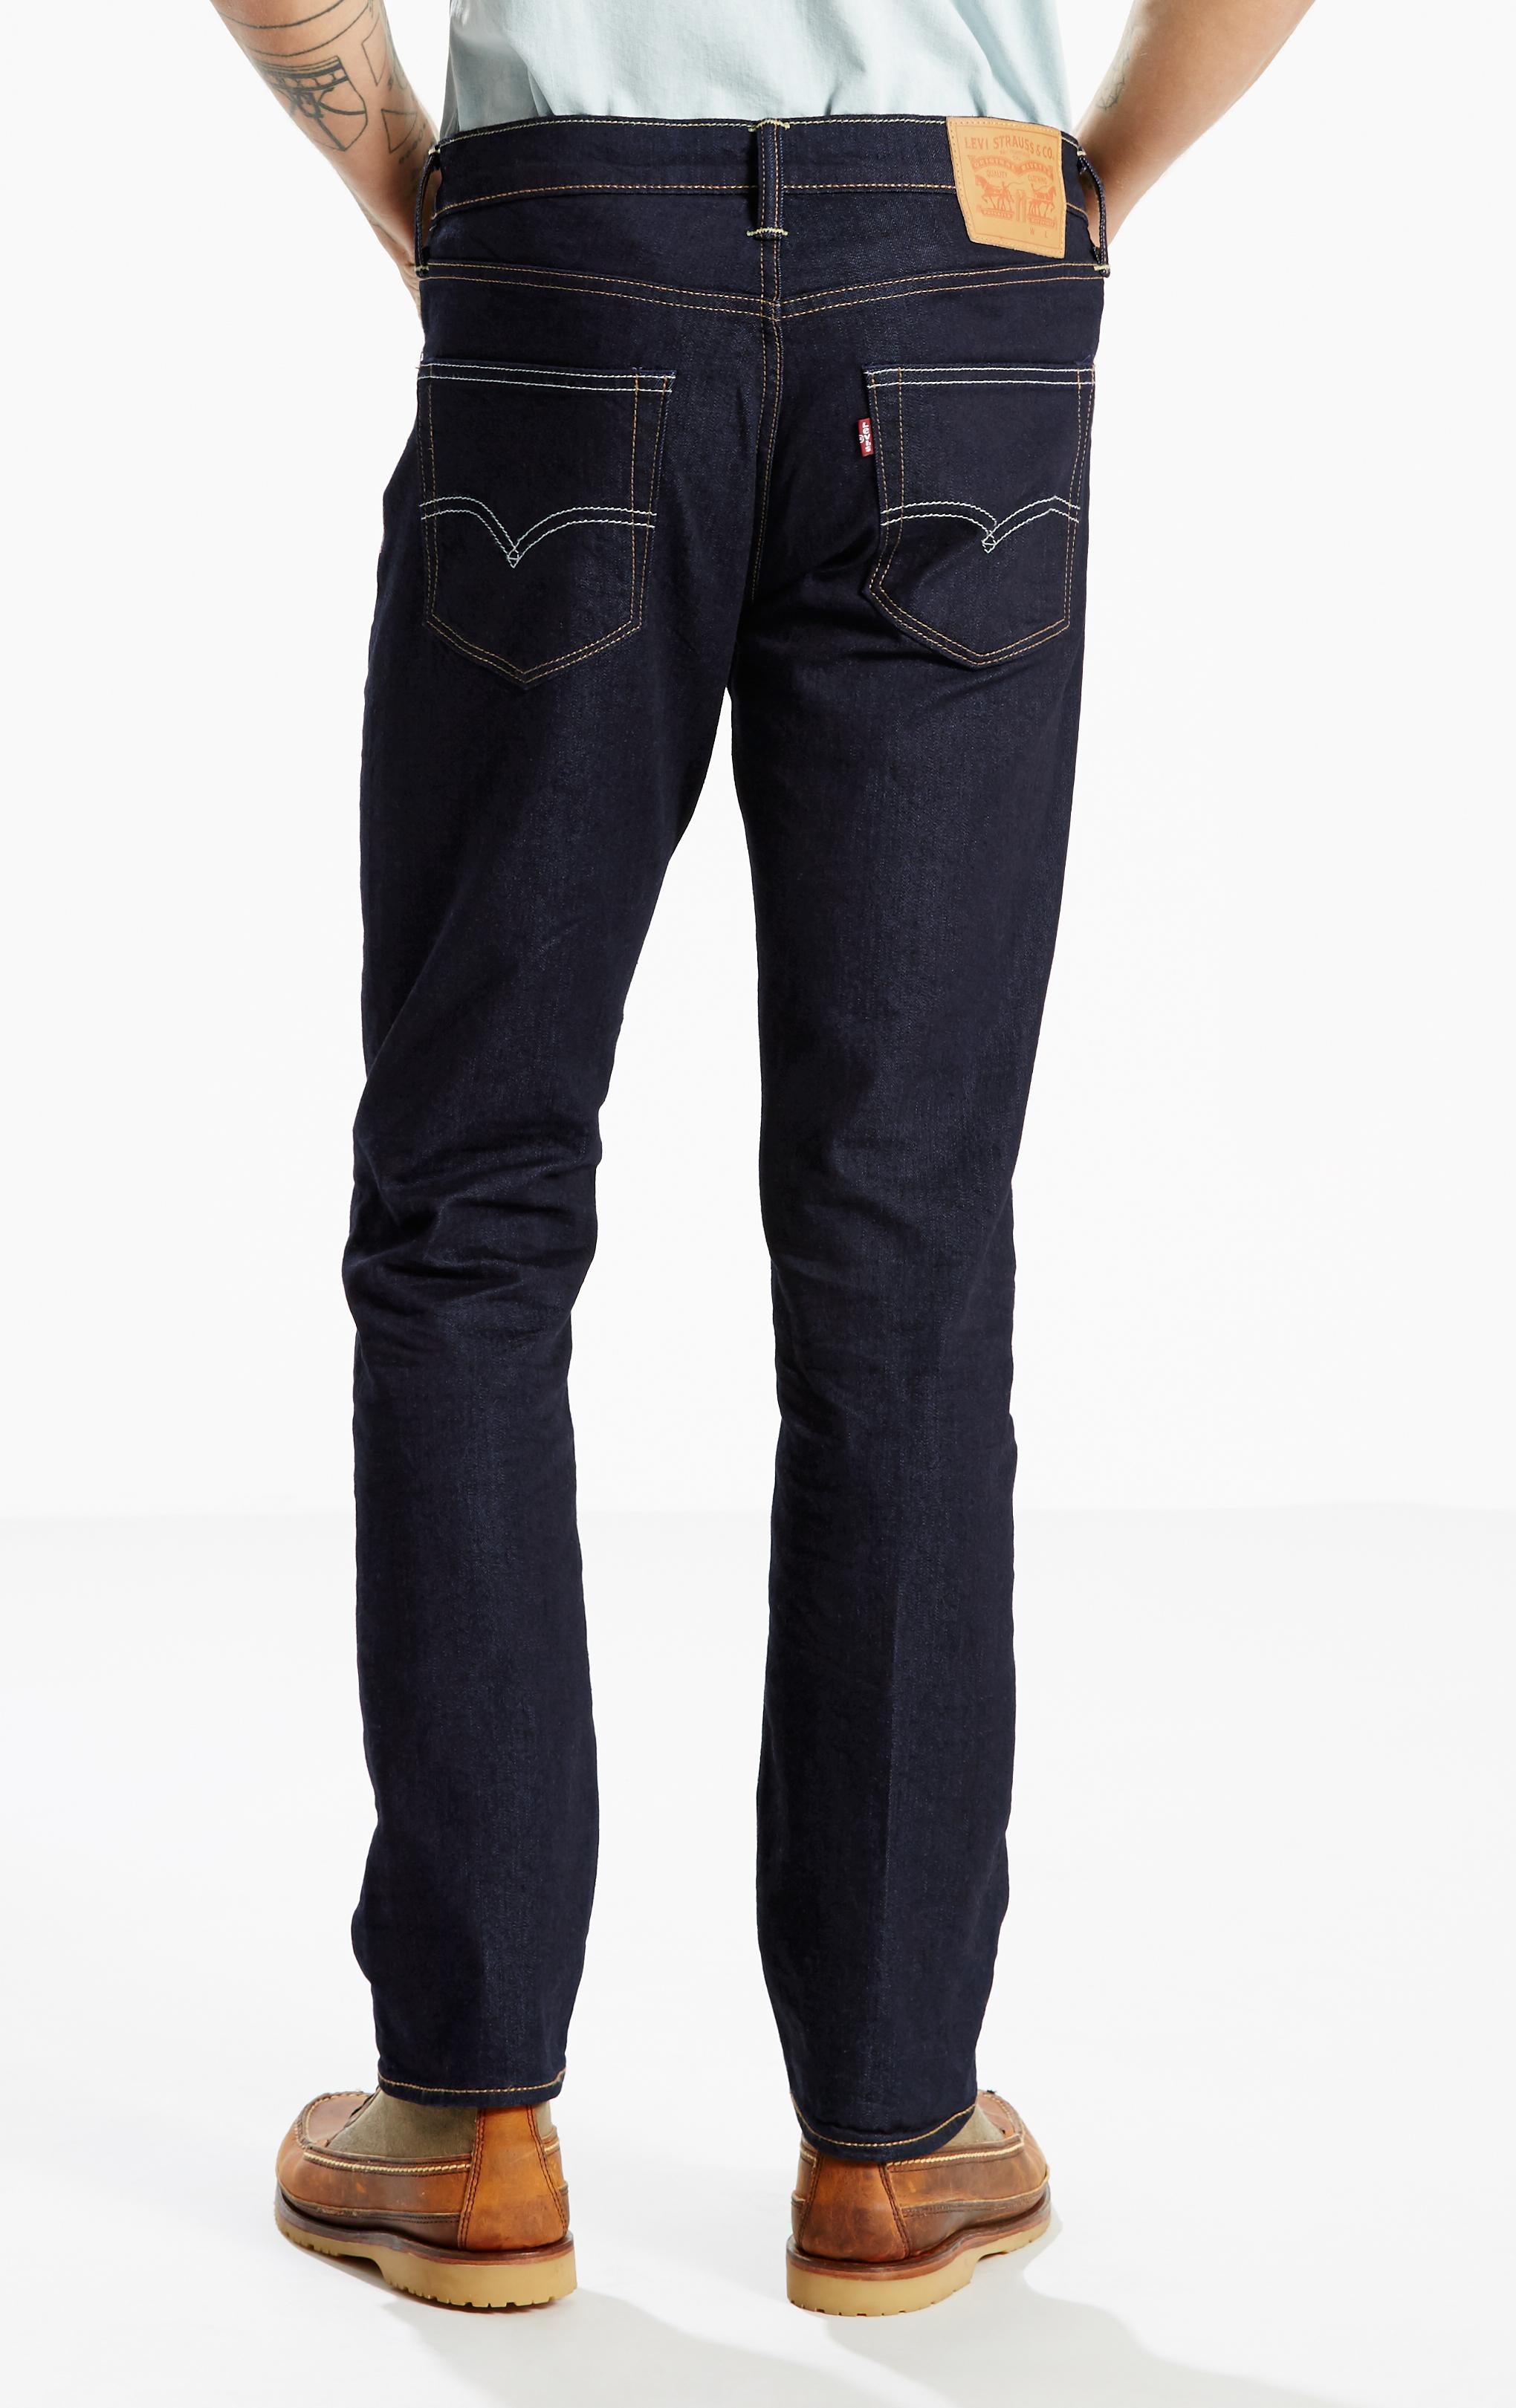 LEVIS Jeanshose Jeans 04511-1786 511 SLIM FIT ROCKCOD W18-LJJ1